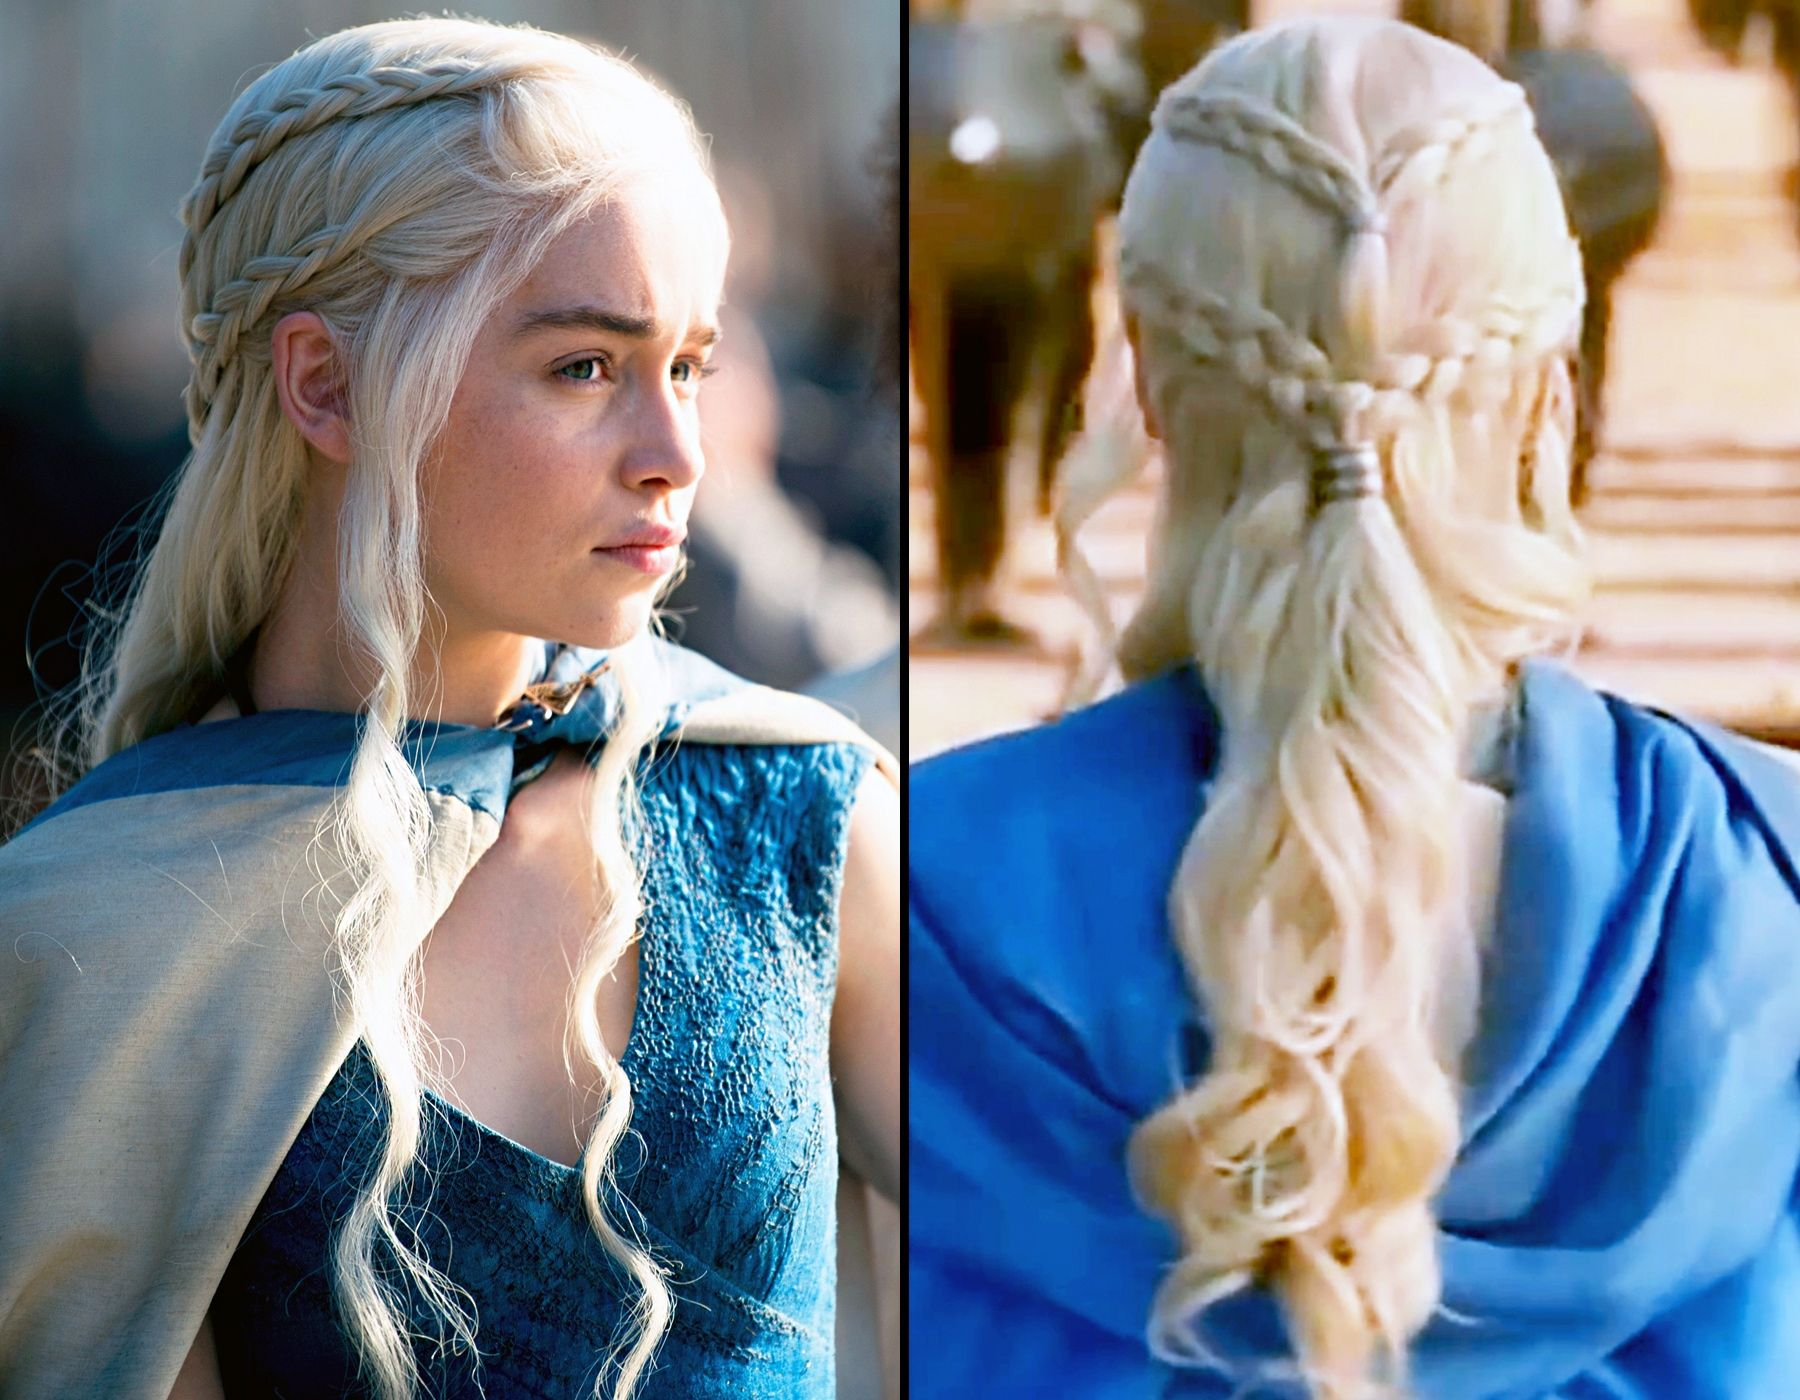 game of thrones braid tutorial copy daenerys 39 elaborate hairstyle prom hairstyles hair. Black Bedroom Furniture Sets. Home Design Ideas